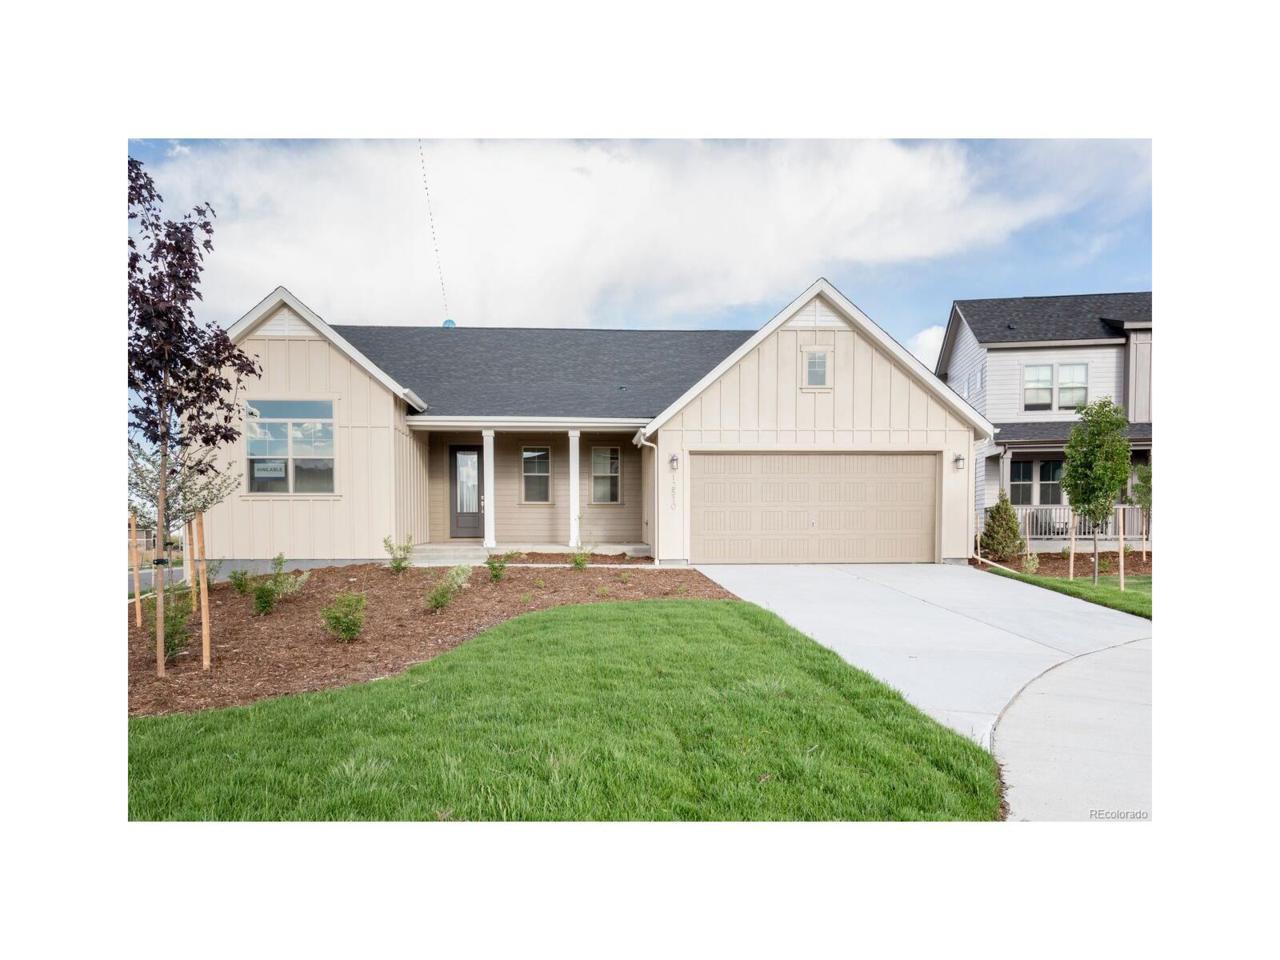 12510 Lake Point Court, Firestone, CO 80504 (MLS #5668797) :: 8z Real Estate